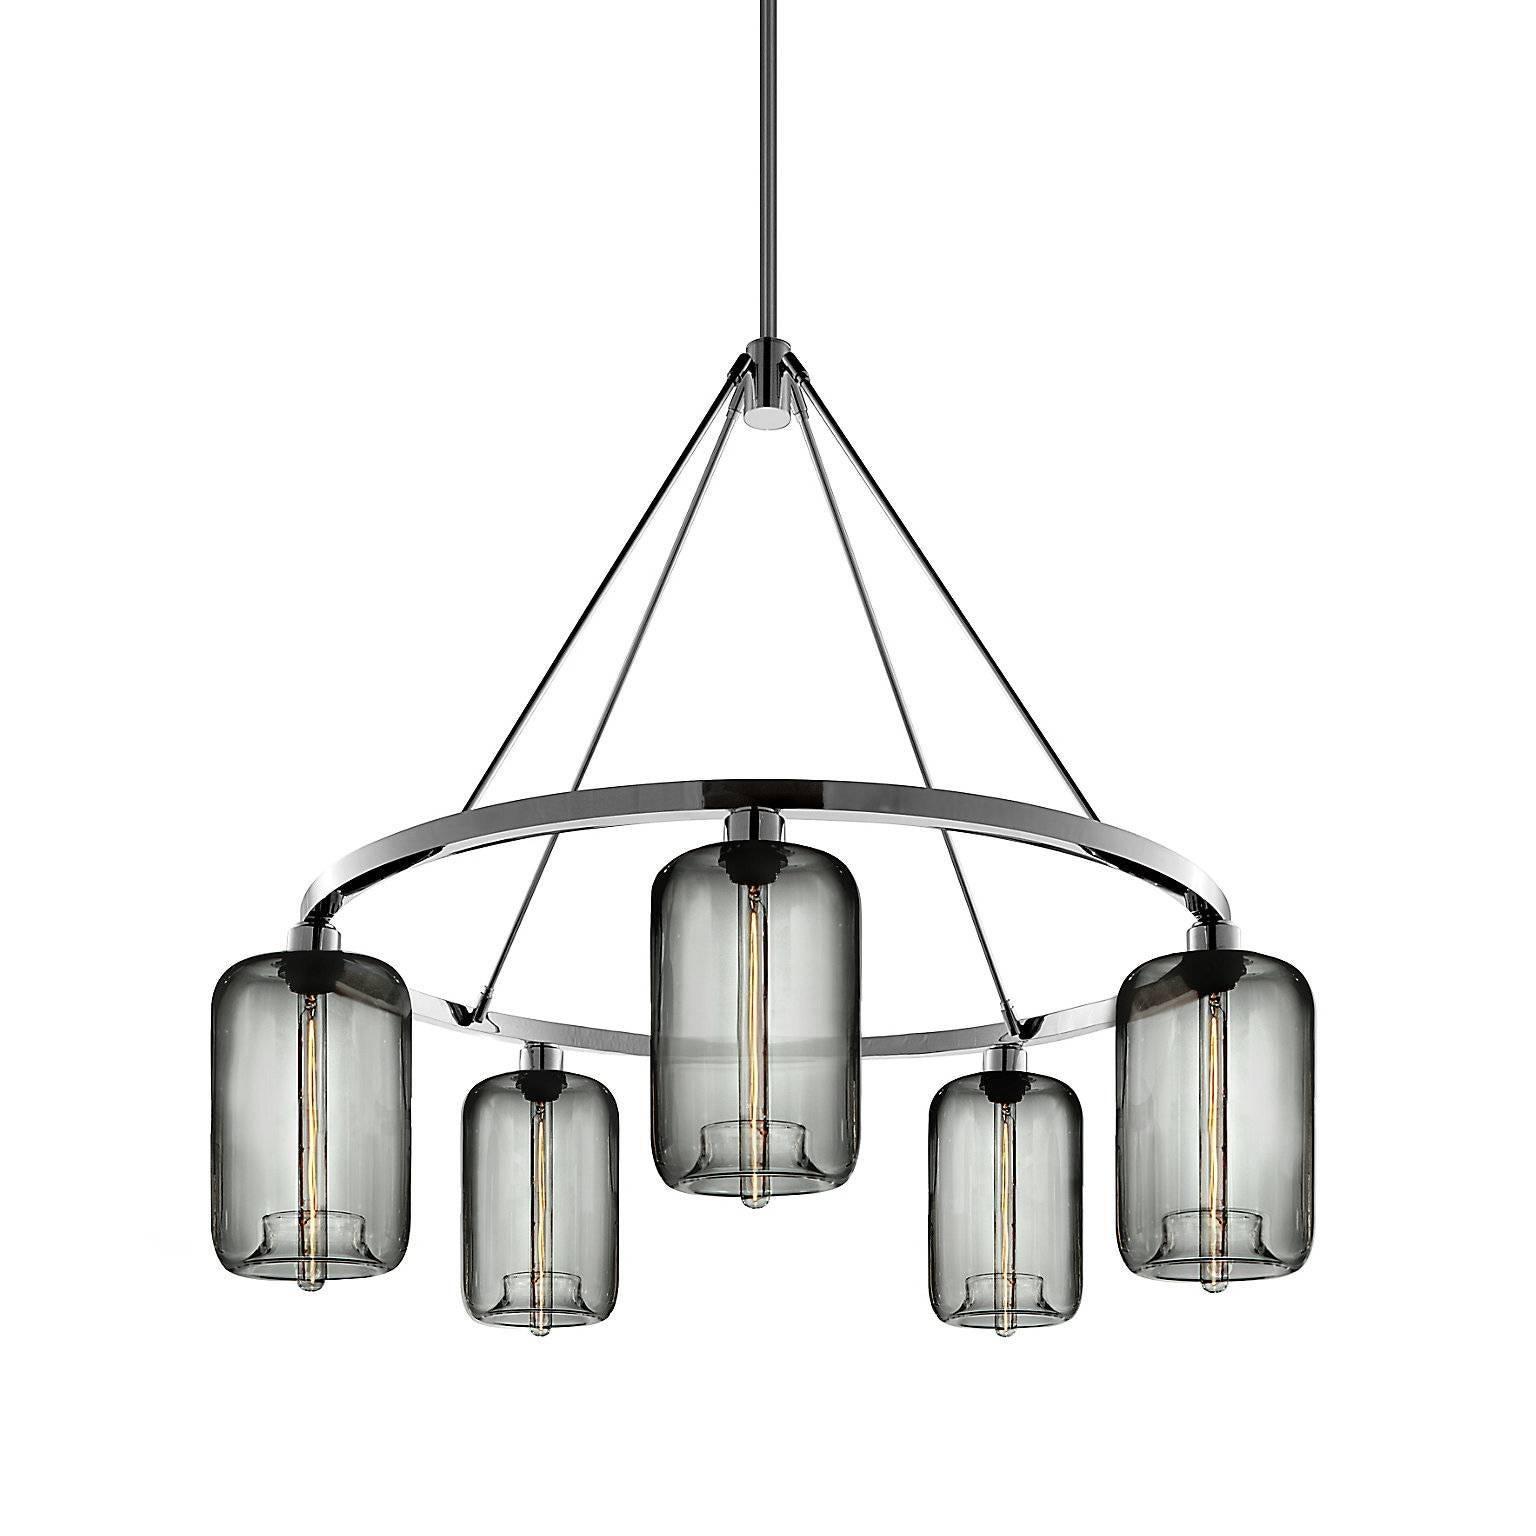 Pod Gray Handblown Modern Glass Polished Nickel Chandelier Light, Made in USA